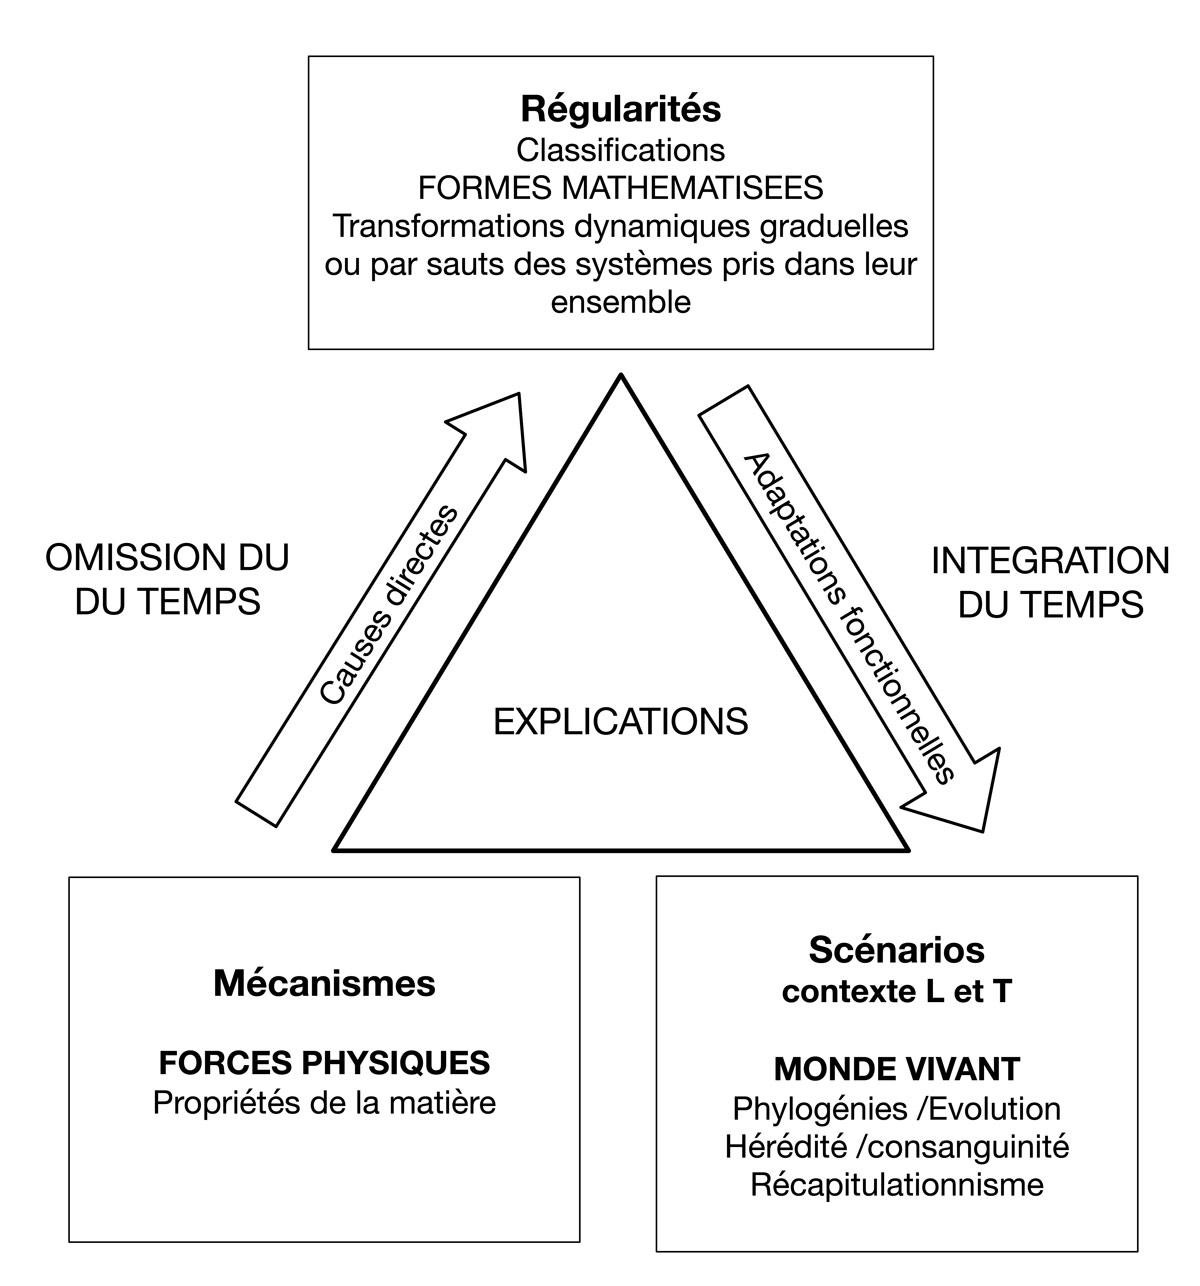 Fig. 5. Les contraintes temporelles dans le processus interprétatif de D'Arcy Thomson. © Gallay.